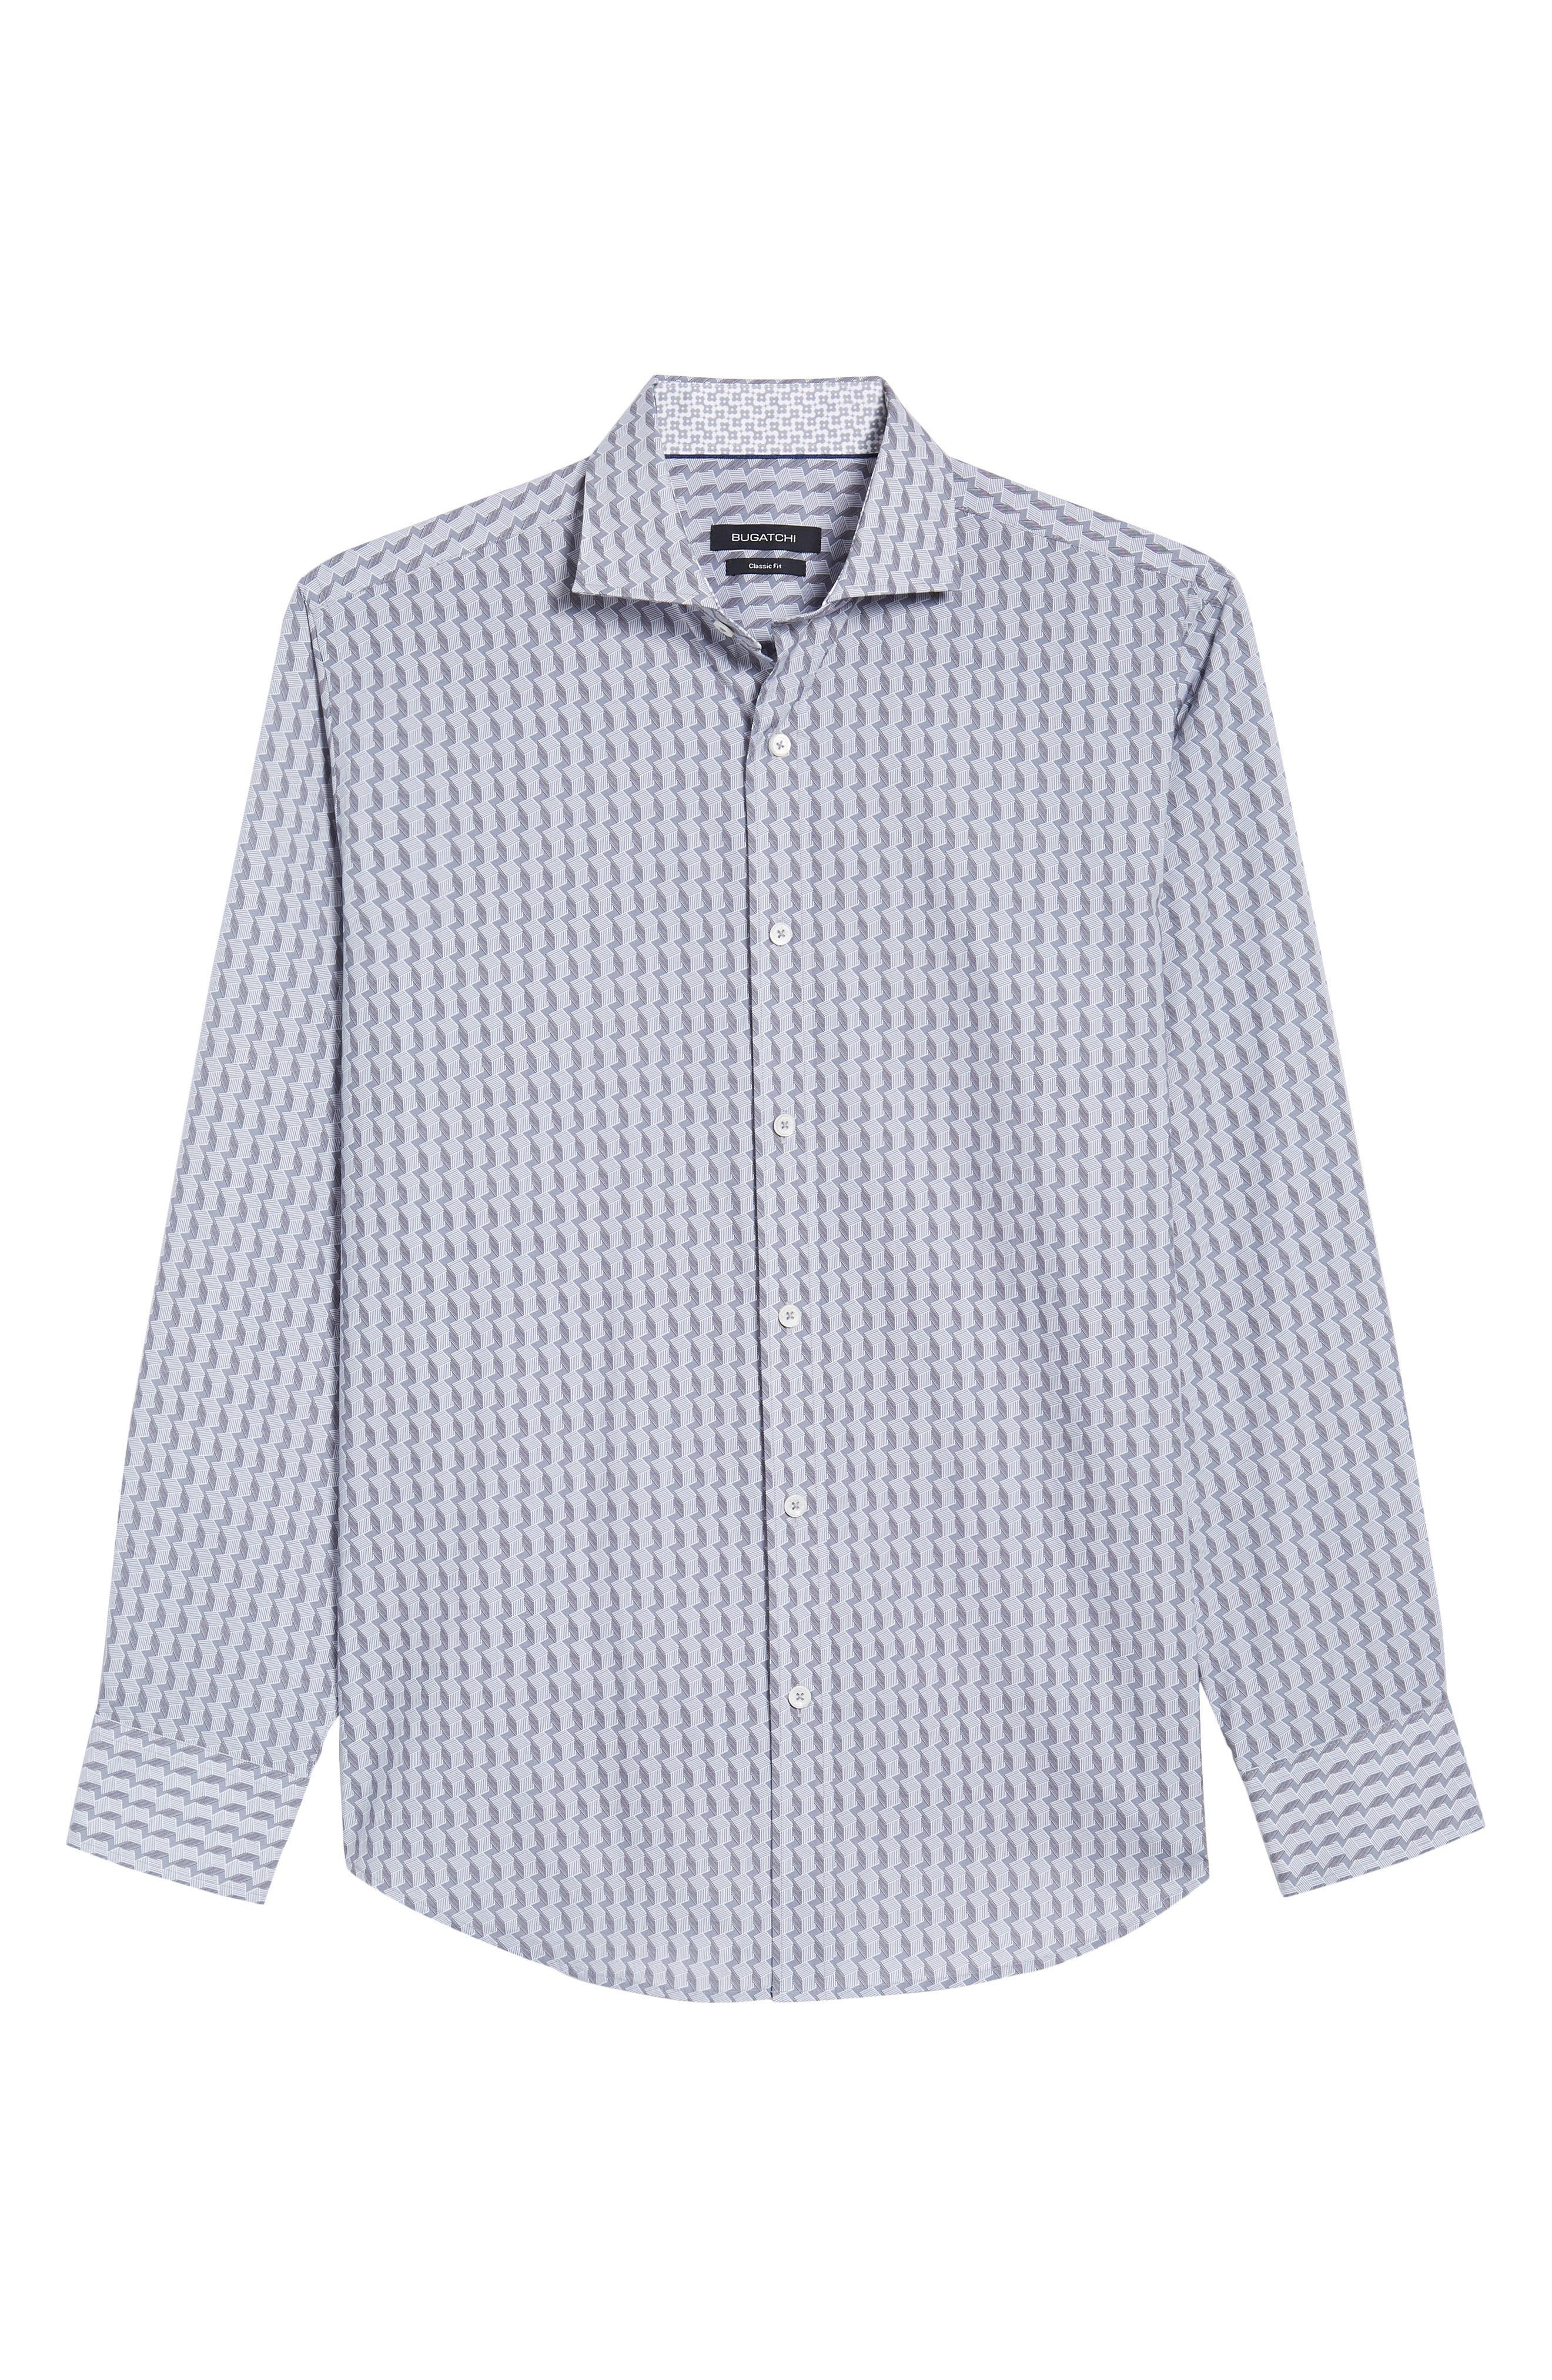 Classic Fit Woven Sport Shirt,                             Alternate thumbnail 6, color,                             020